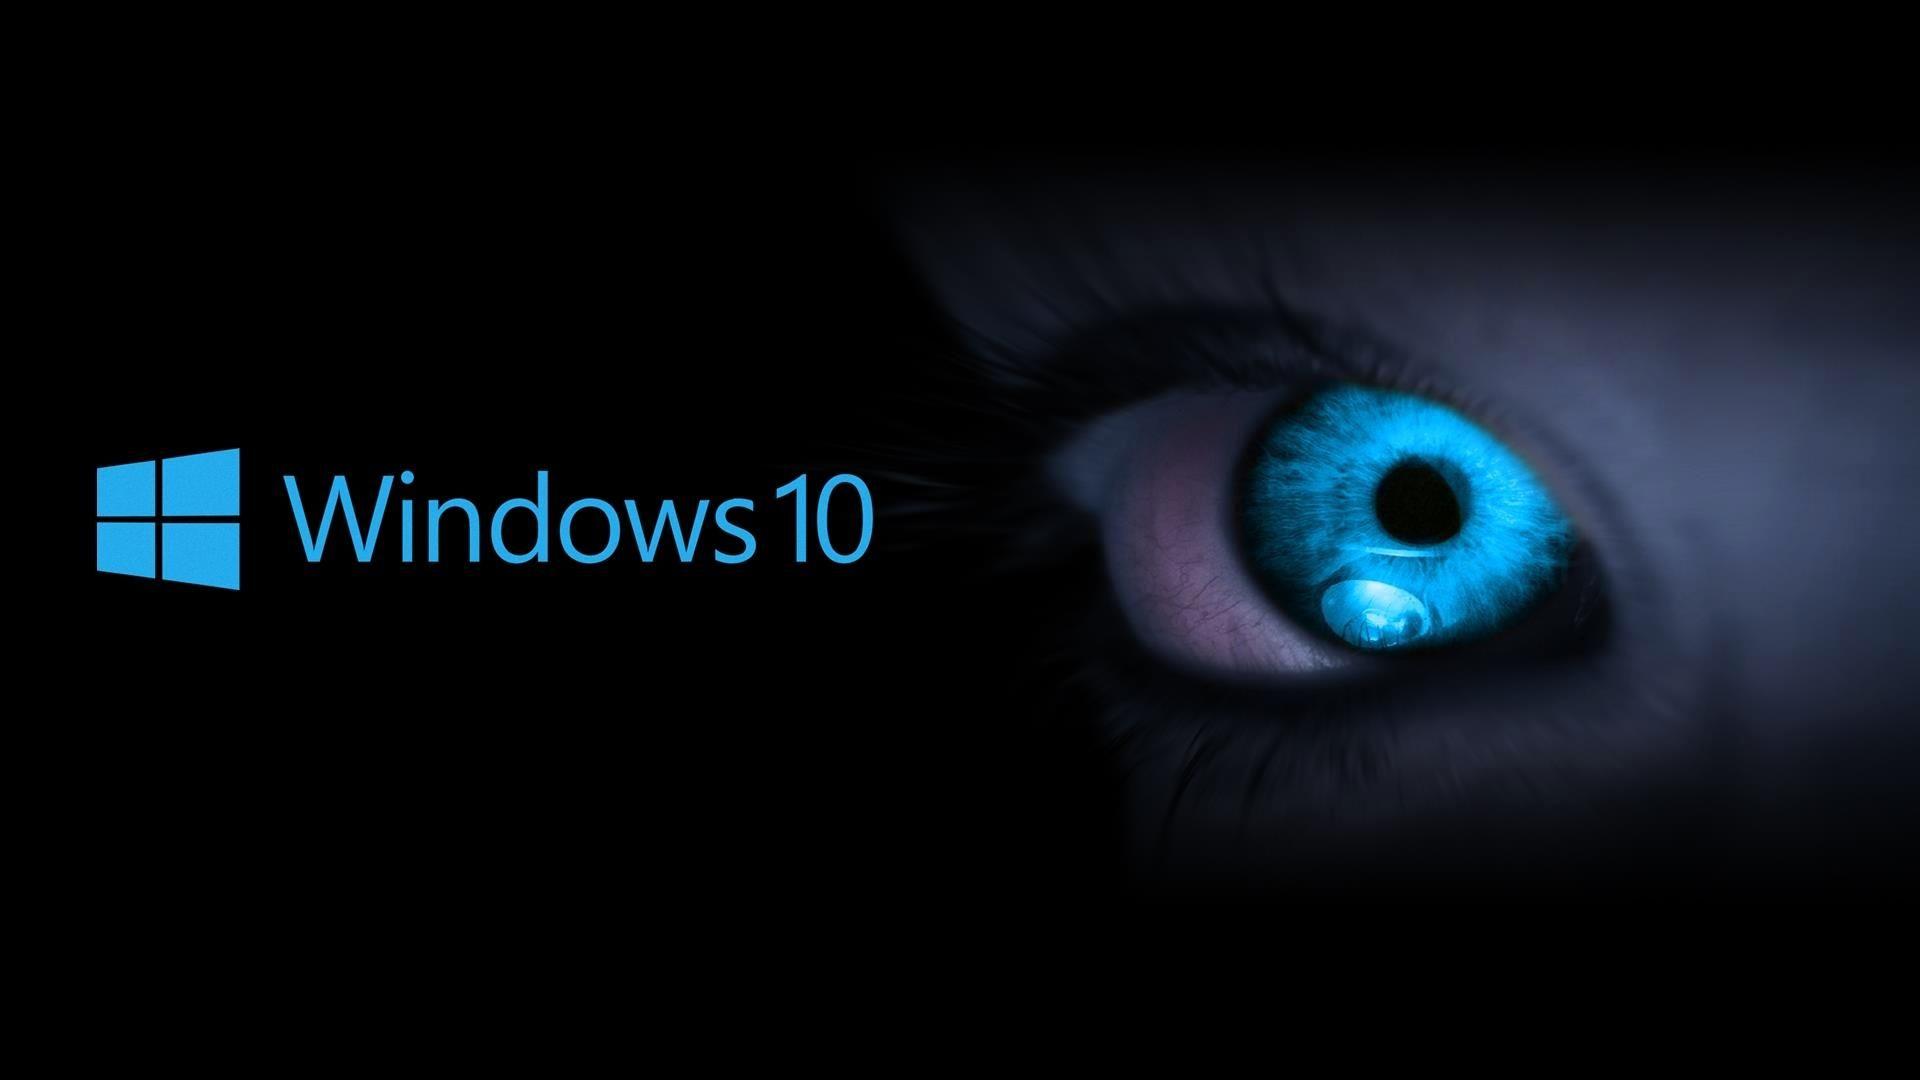 4k Windows 10 Wallpapers High Quality Download Free In 2020 Windows Wallpaper Wallpaper Windows 10 Hd Wallpaper Desktop